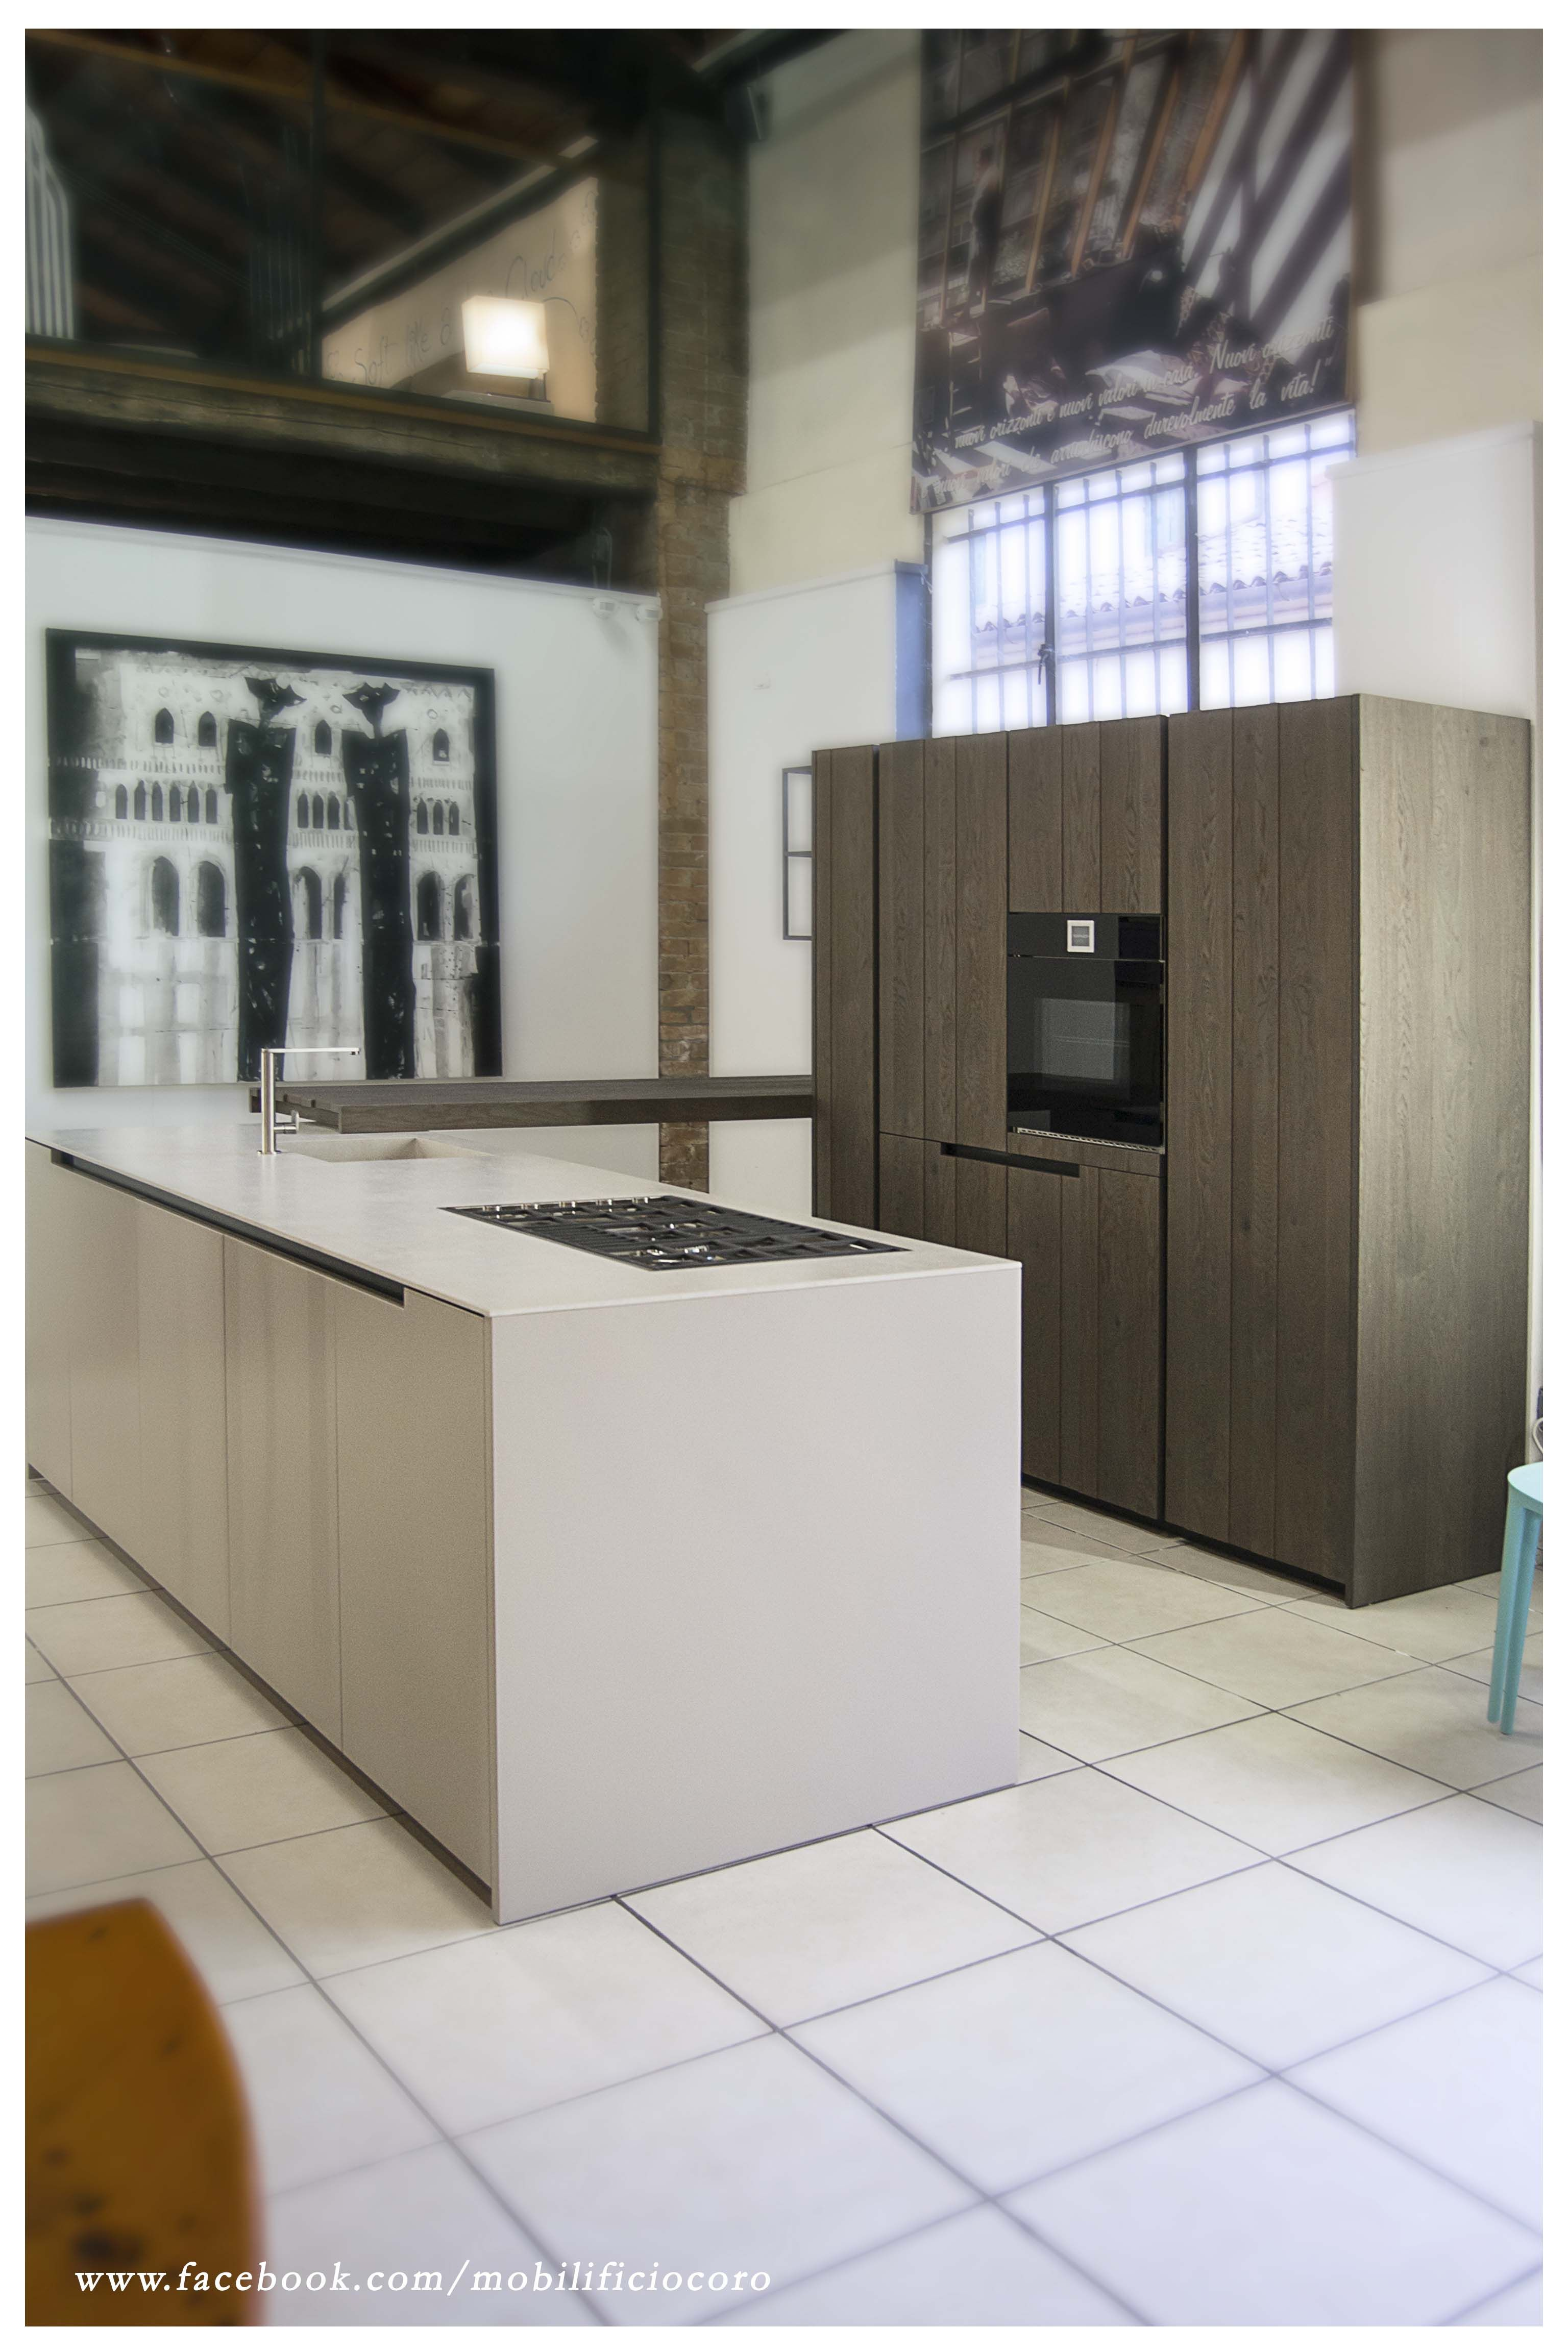 Showroom cucine stosa cucine nello showroom simona e luka arredamenti terracina lt with - Zampieri cucine showroom ...